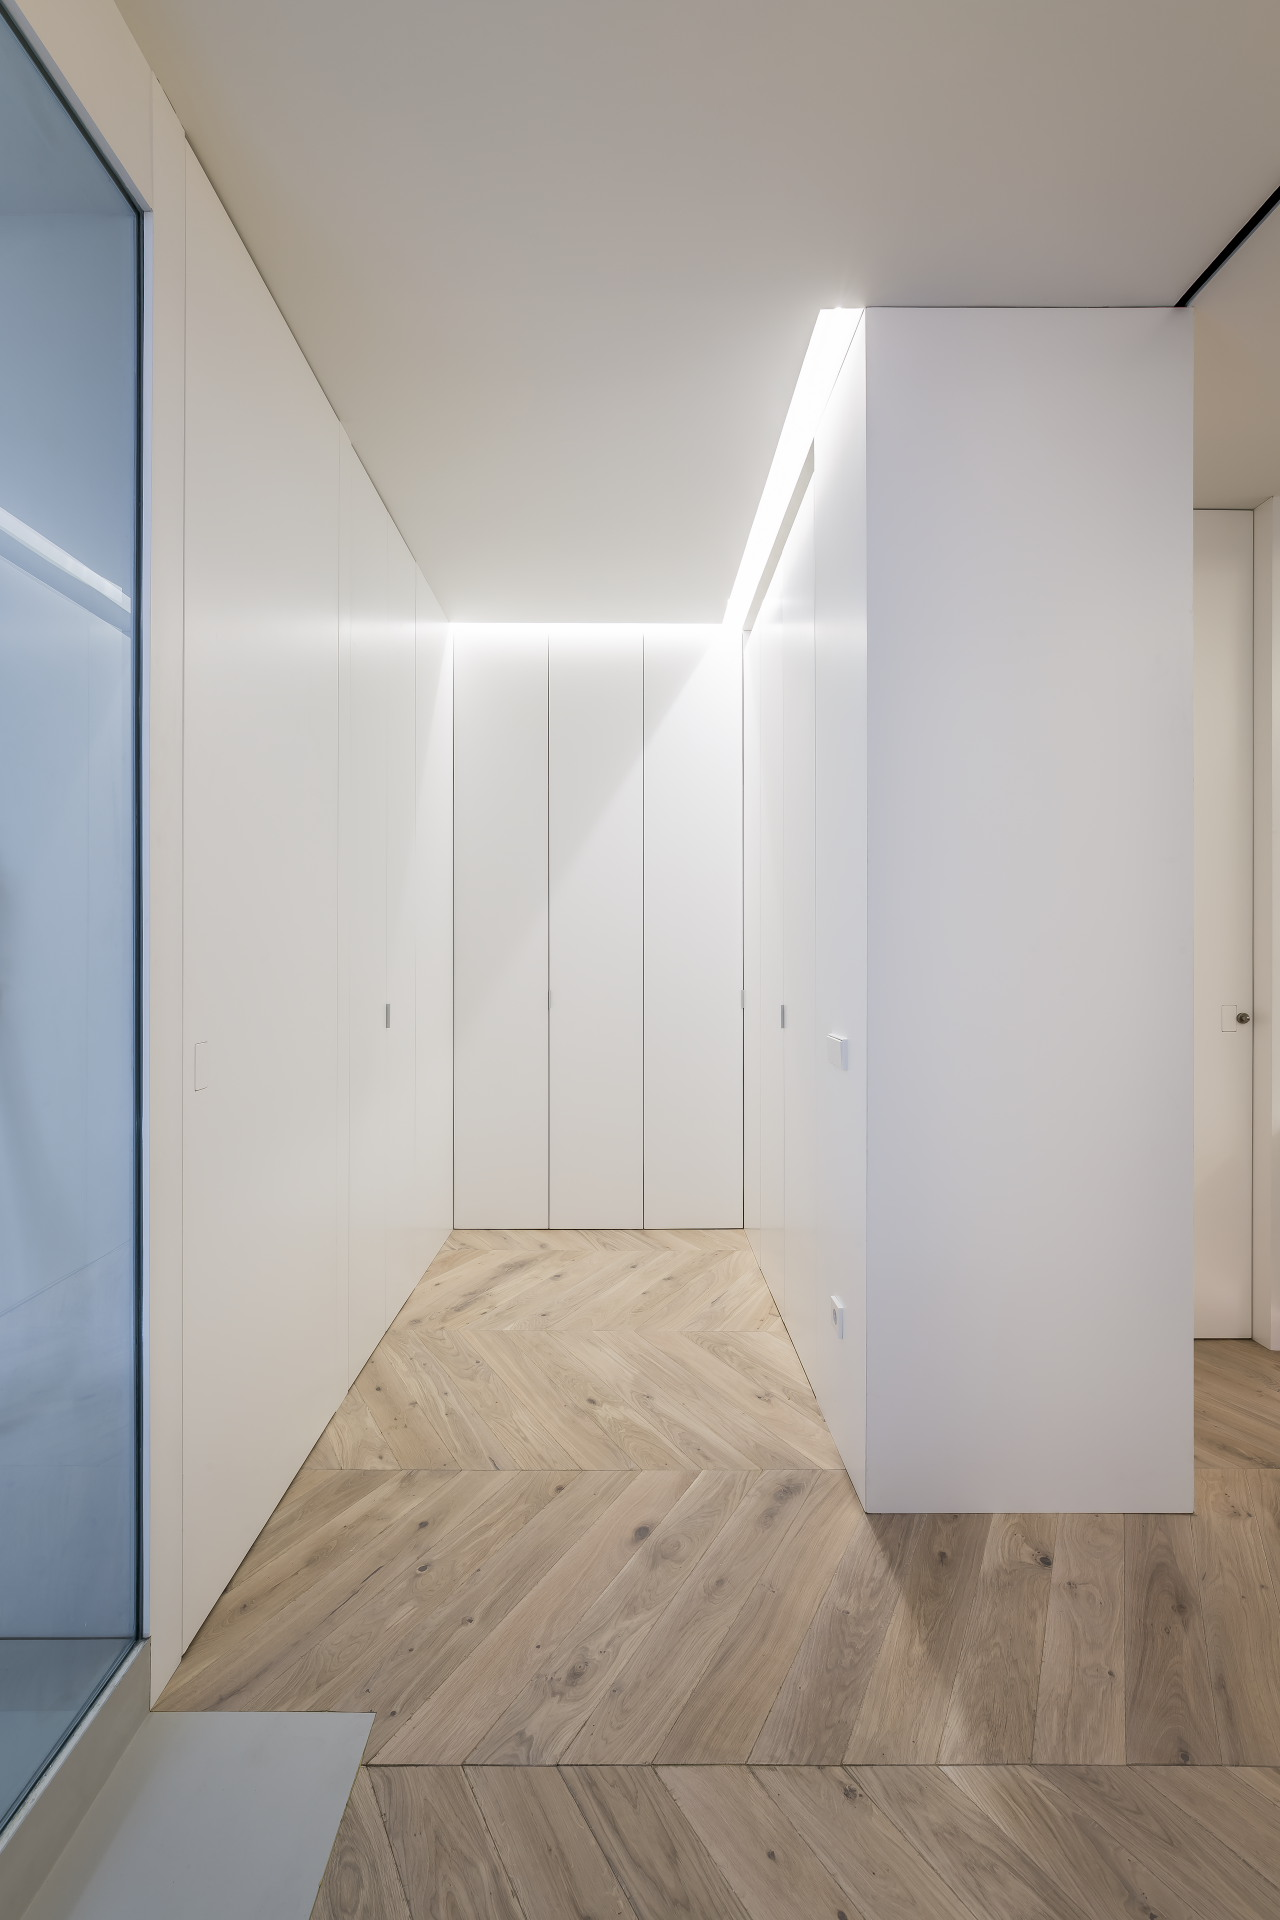 fotografia-arquitectura-valencia-german-cabo-gallardo-llopis-bfm-edificatoria-turia01 (42)